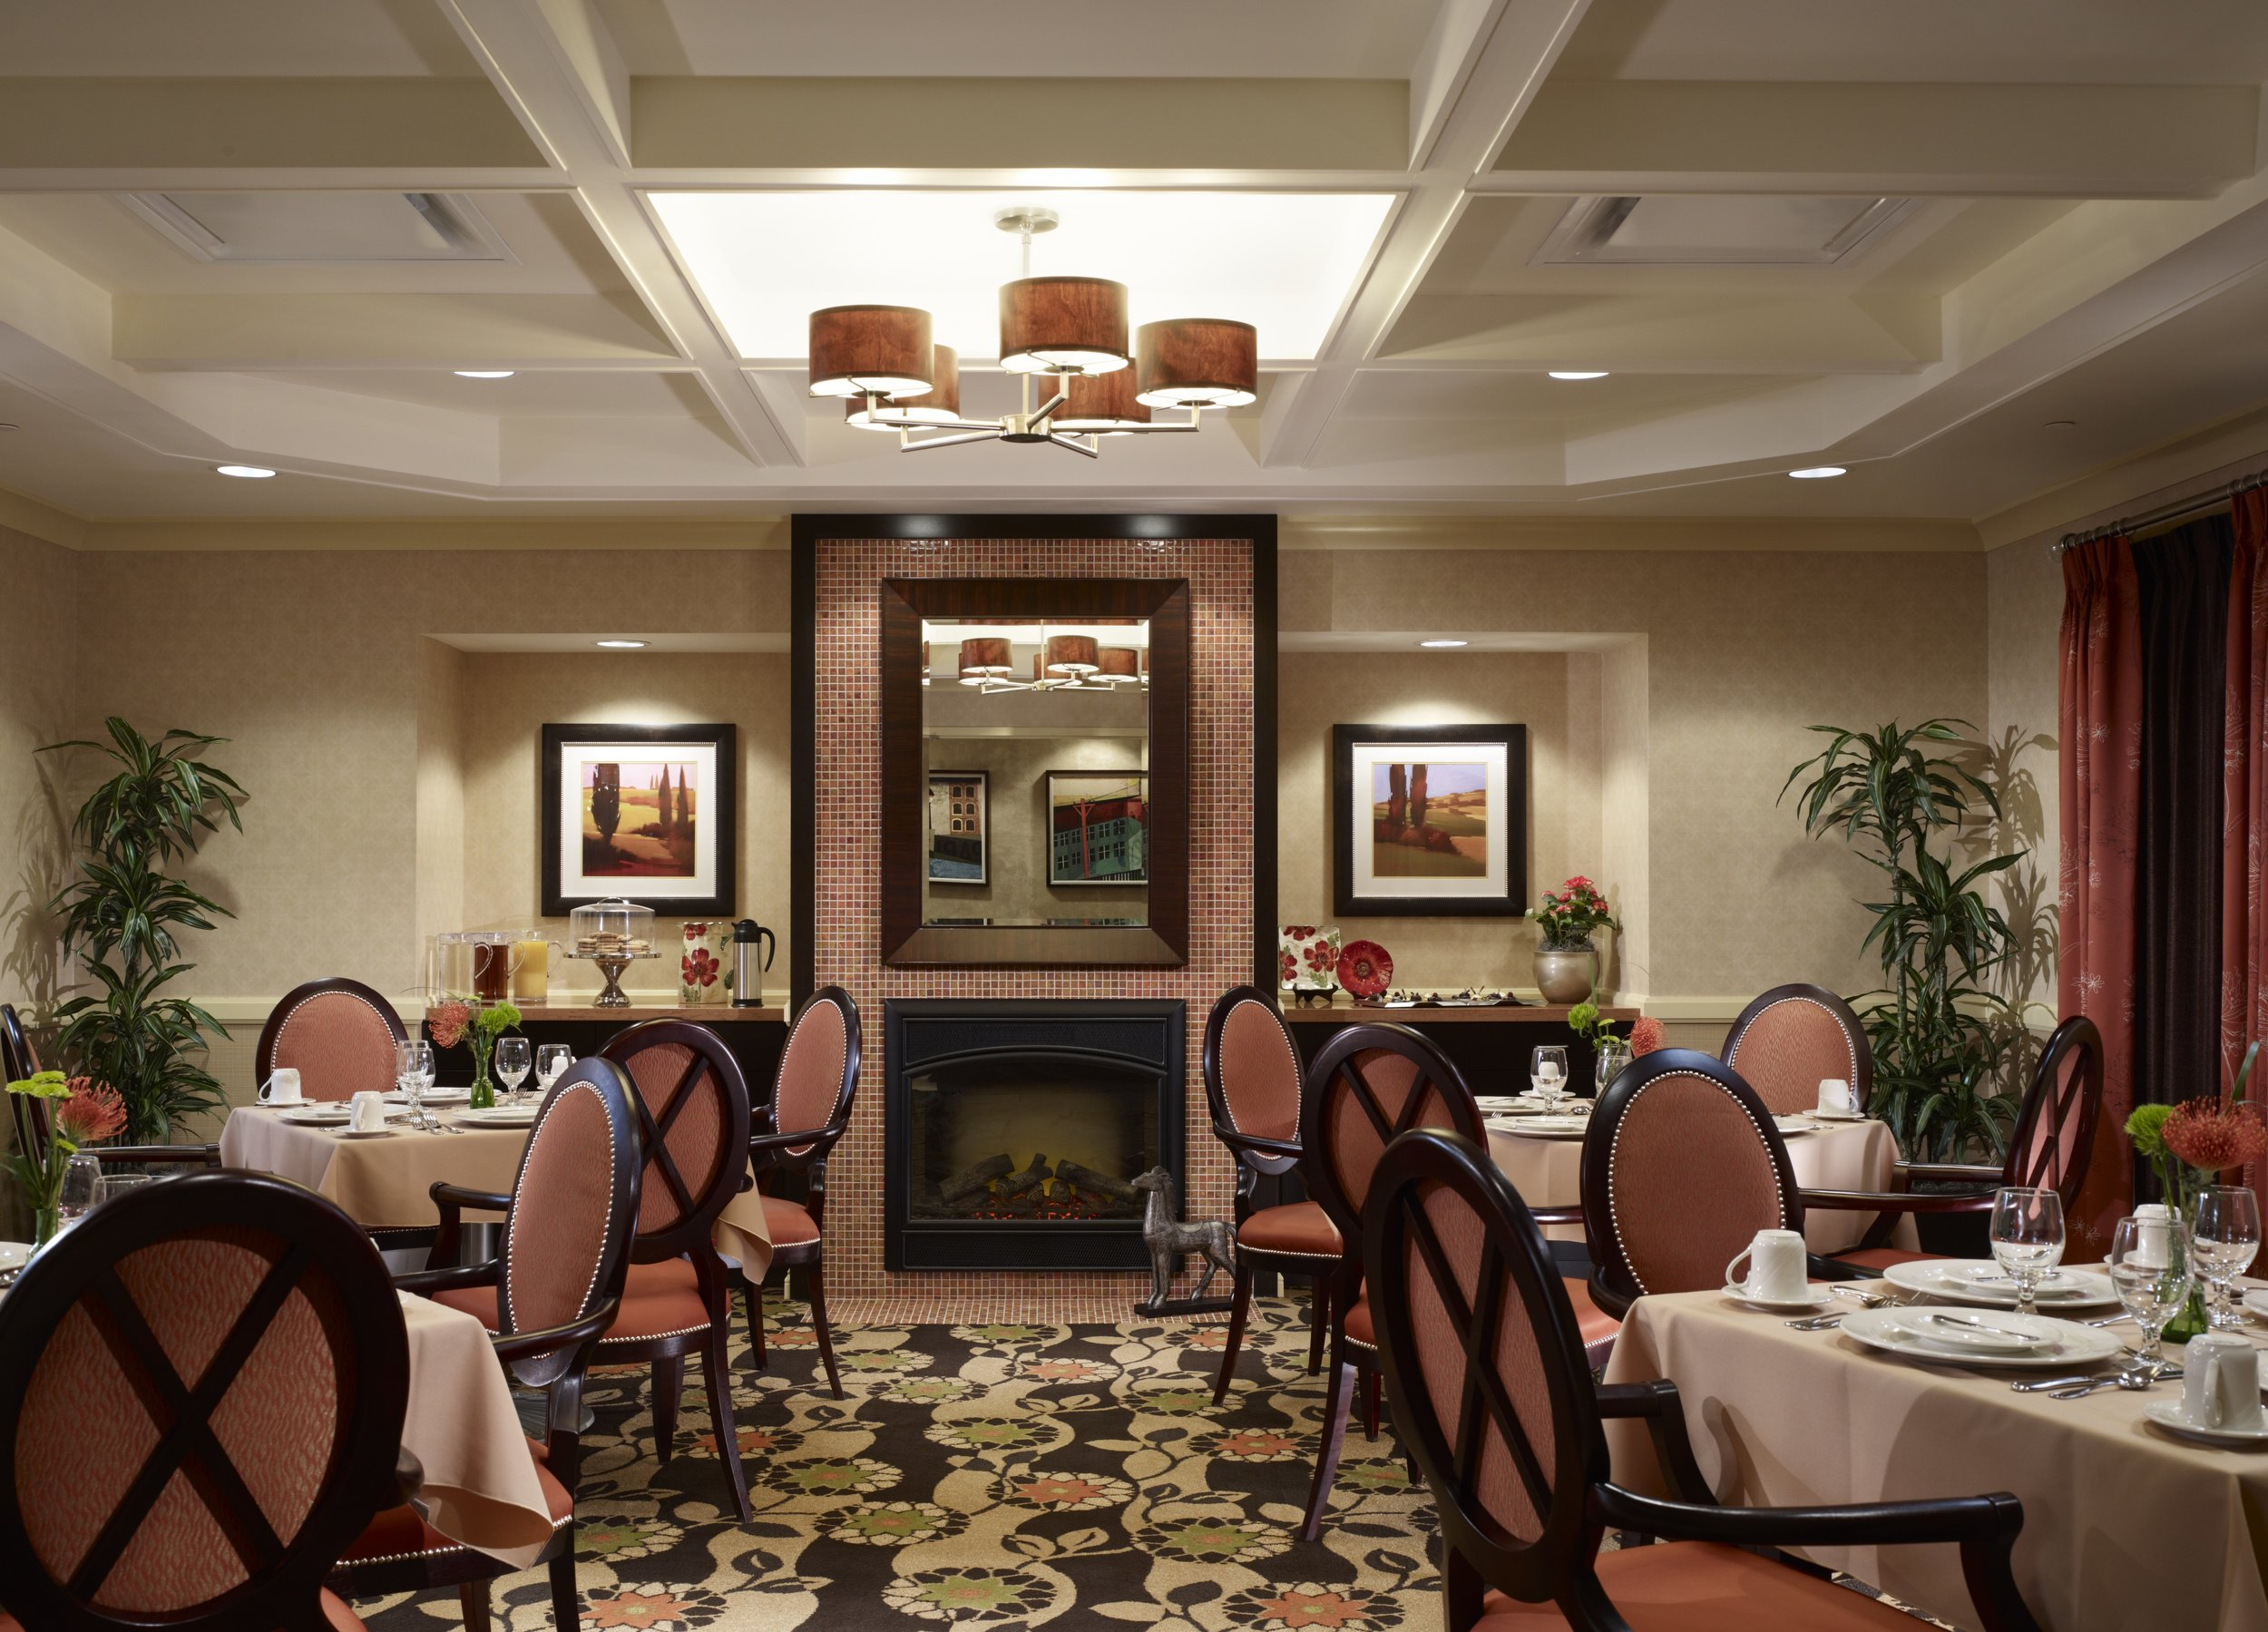 Dining Room jpeg.jpg